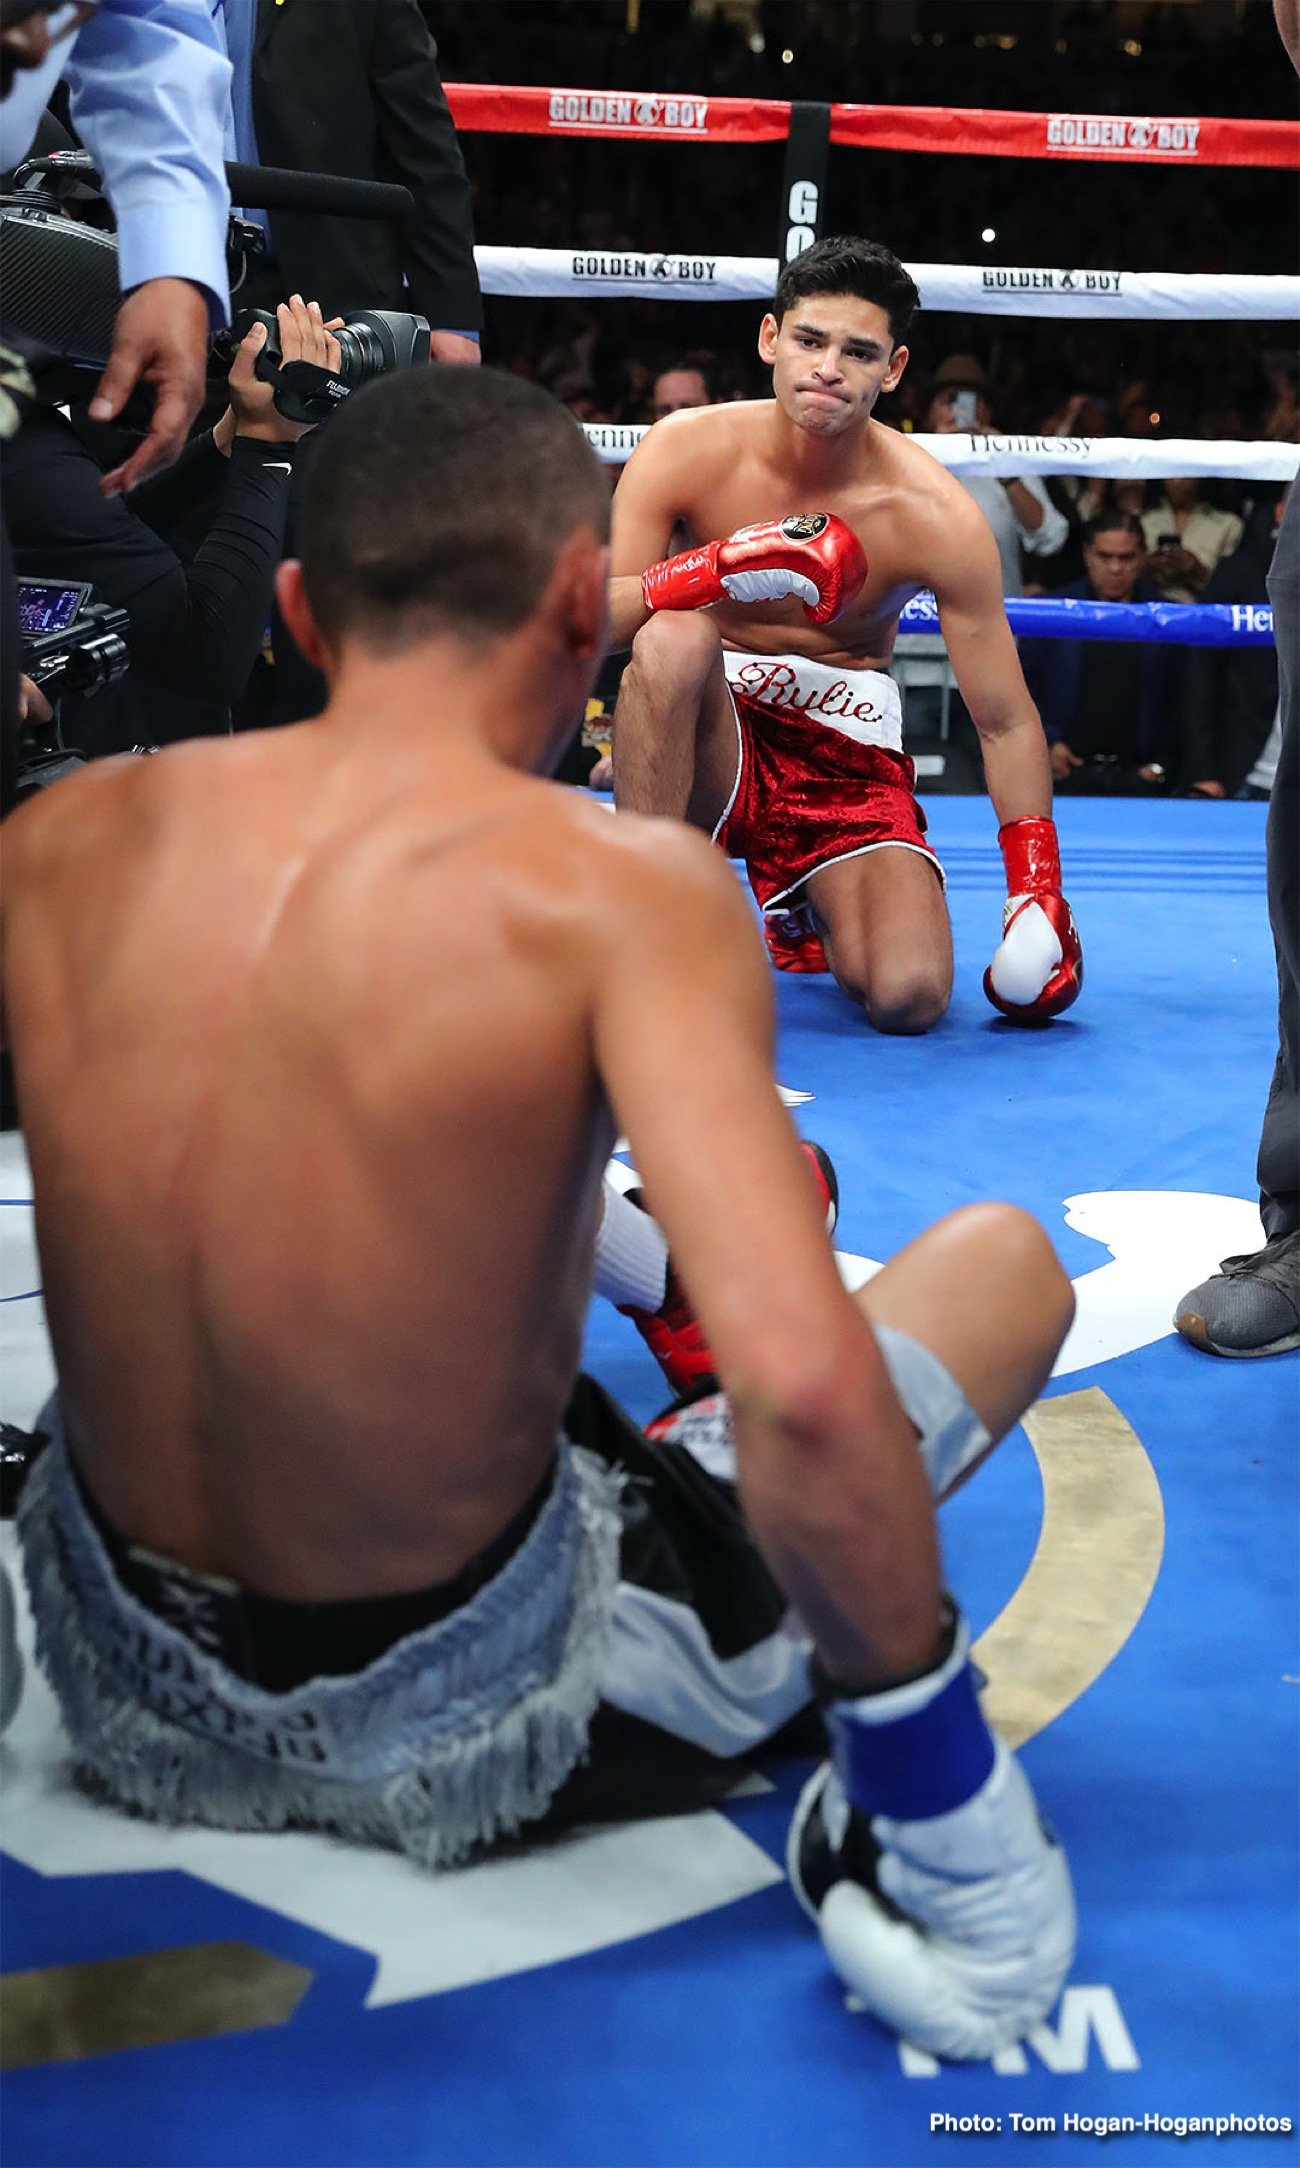 boxing-GarciaFonseca_Hoganphotos2.jpg